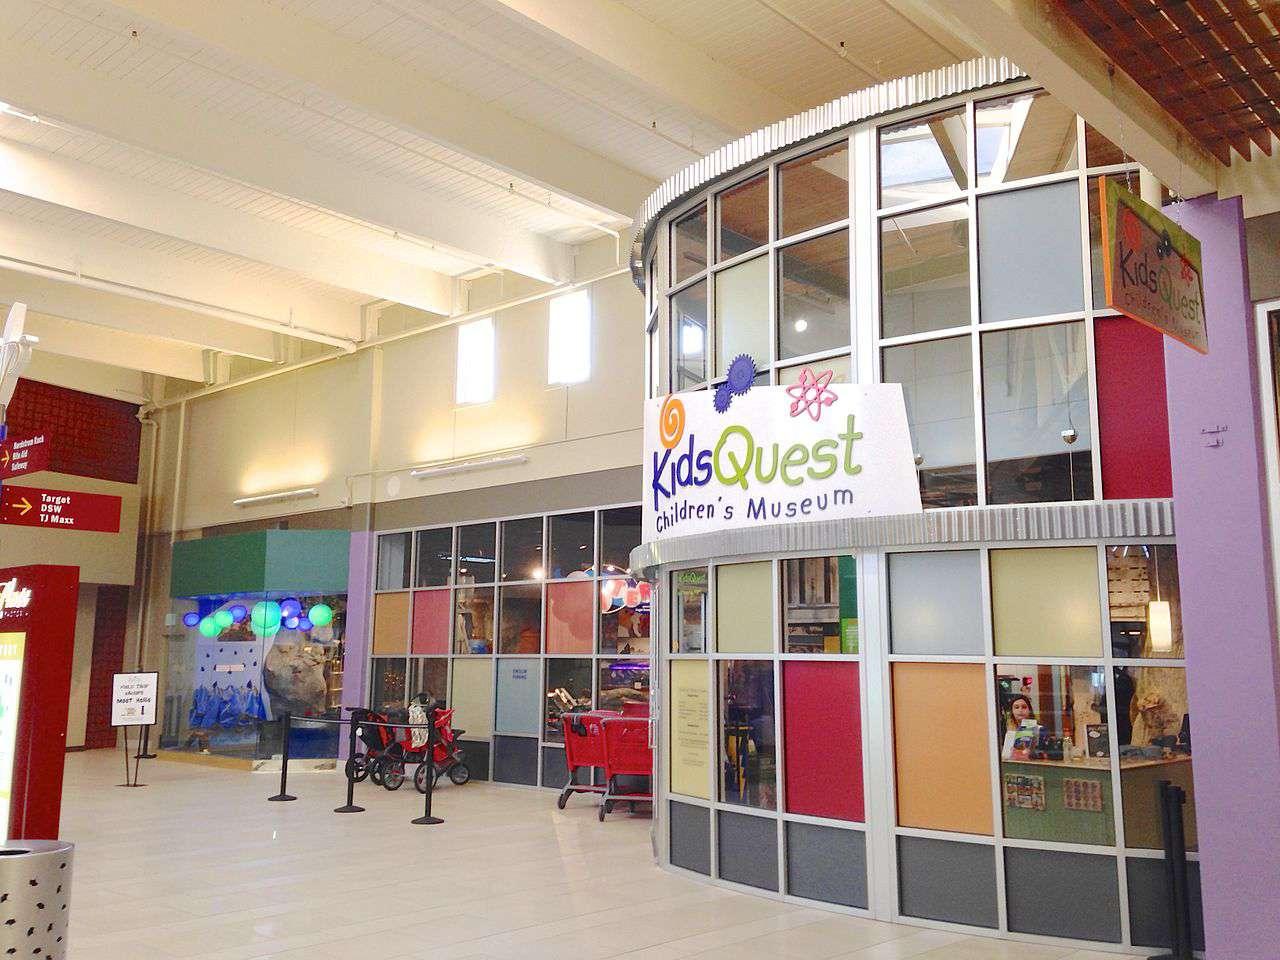 The Kid's Quest Children's Museum